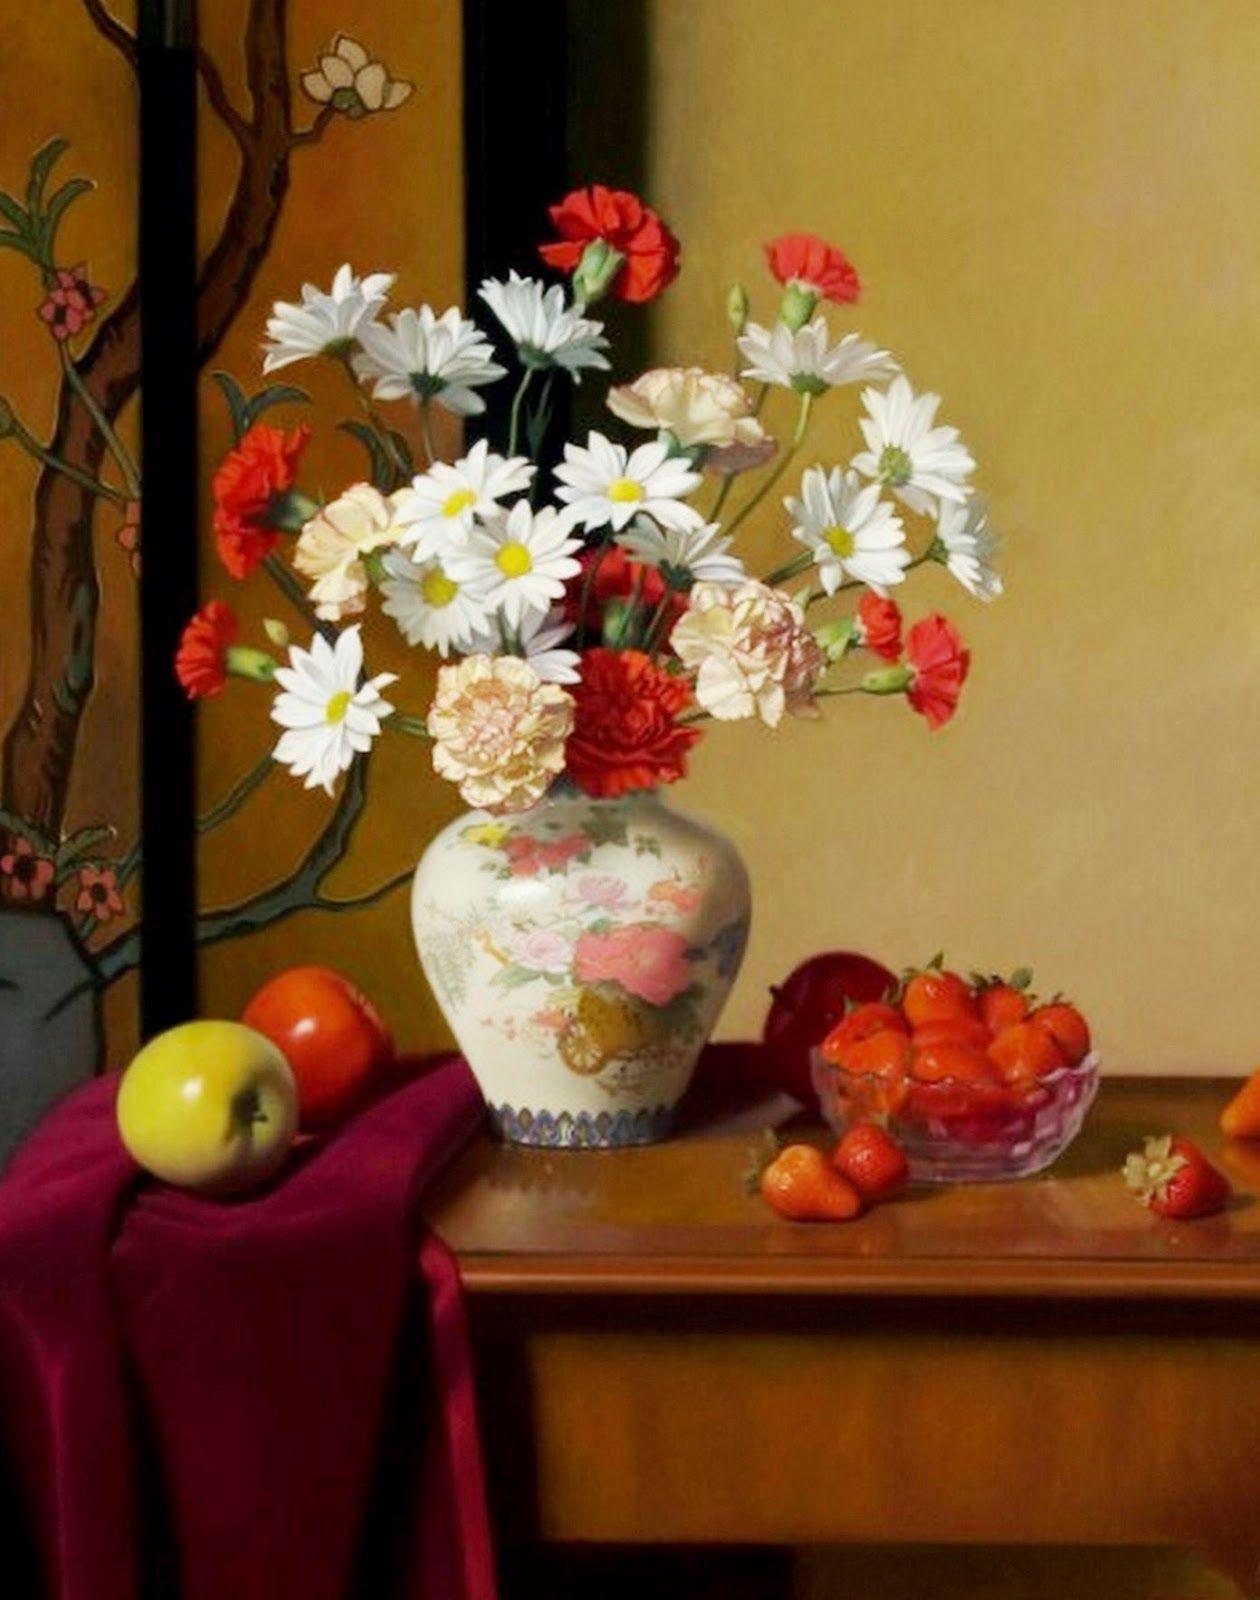 Pin von rosa santacruz auf arte | Pinterest